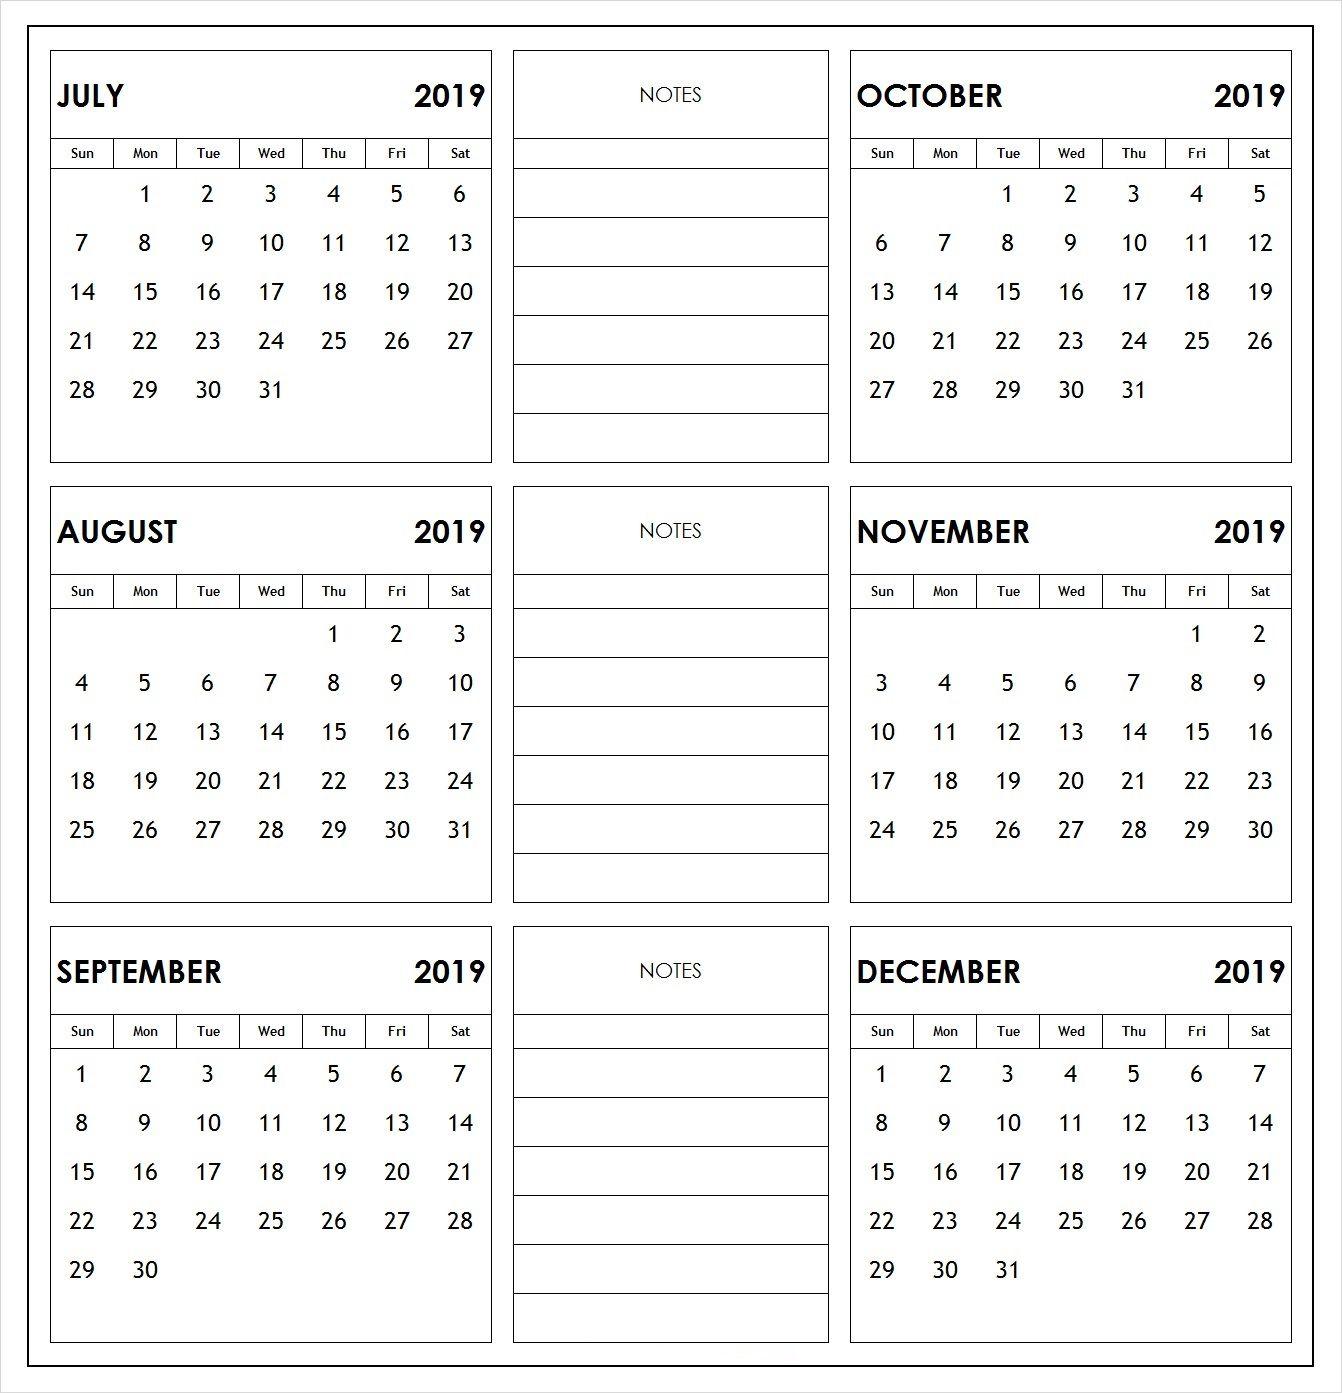 6 Month Calendar 2019 2019 half year print calendar | 2019 Calendars in 2019 | Academic